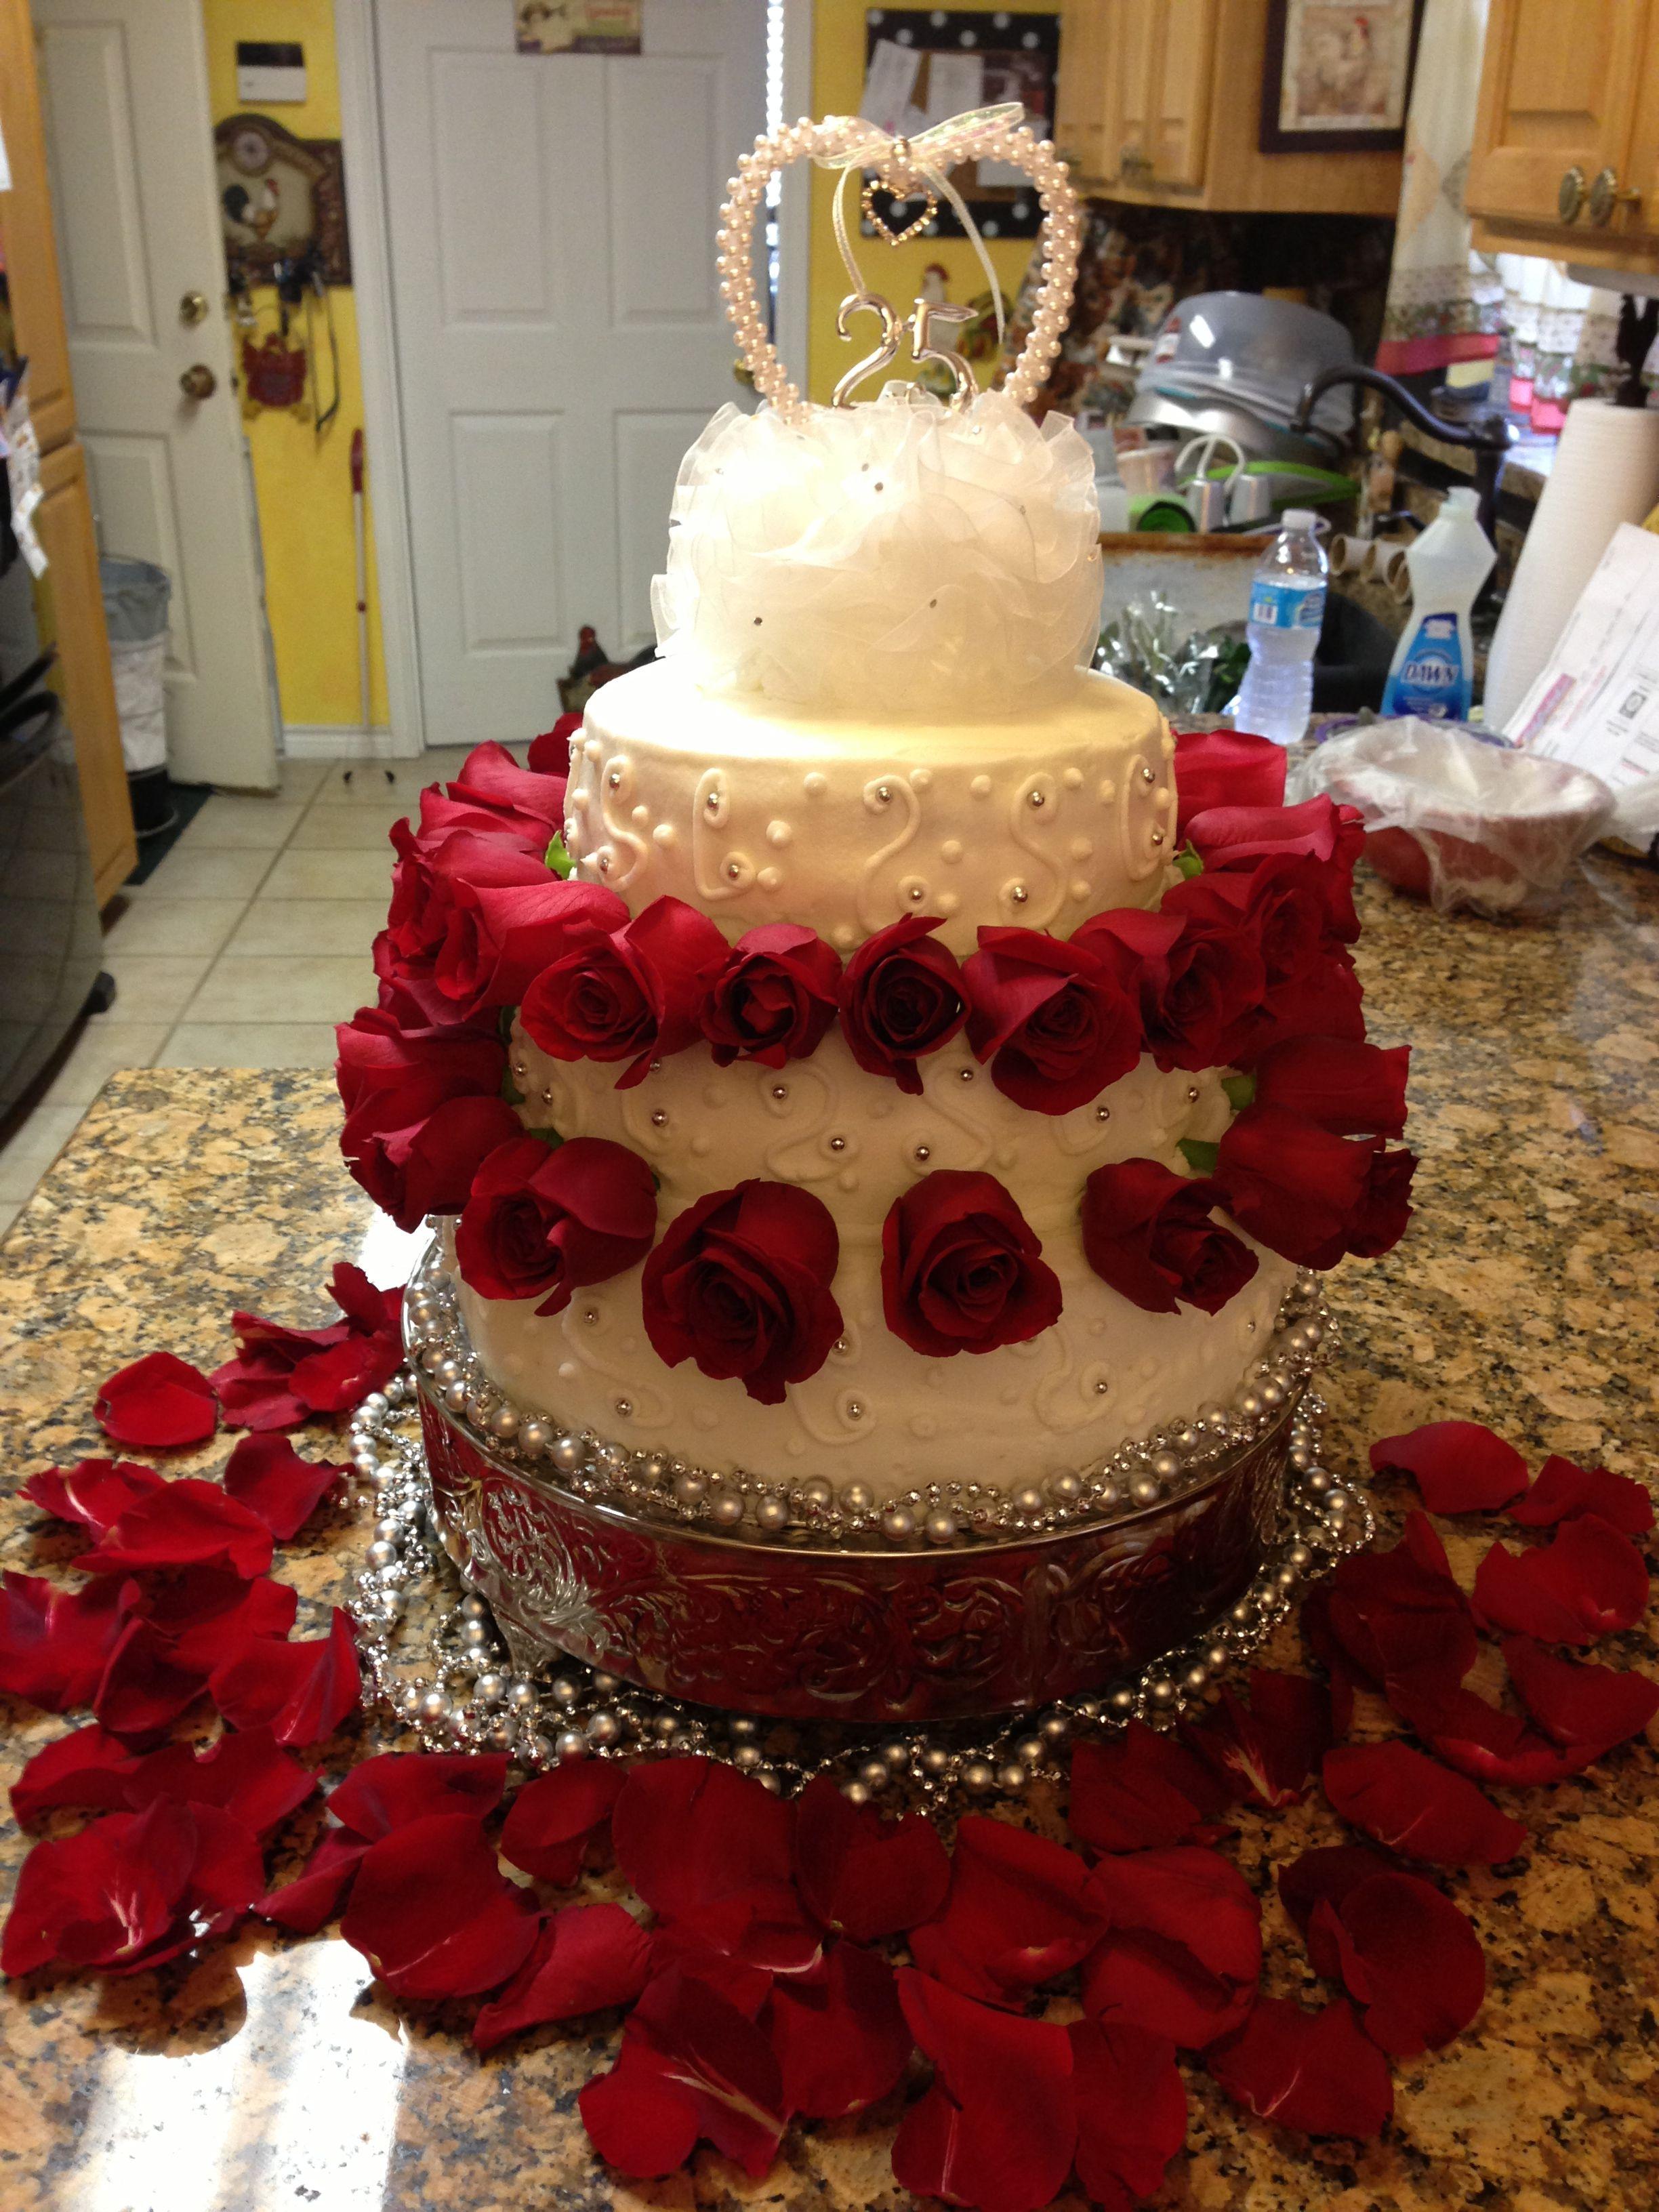 25th Wedding Anniversary Cake! ウェディングケーキ